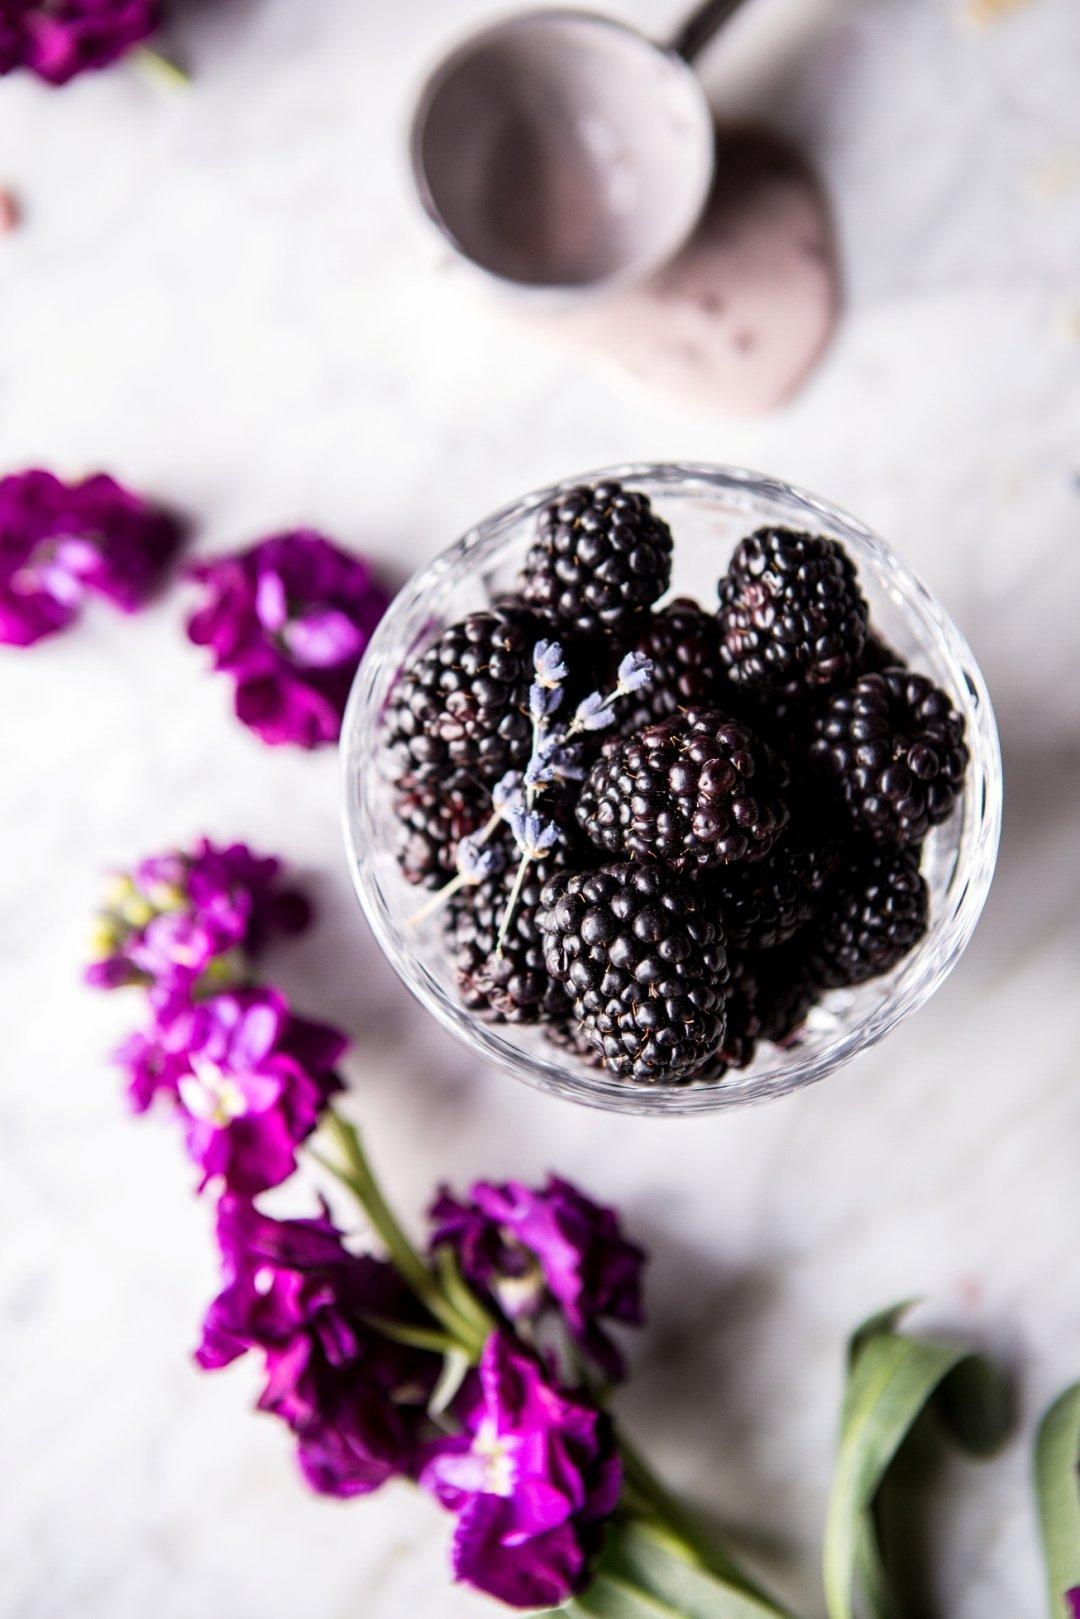 Blackberries in glass